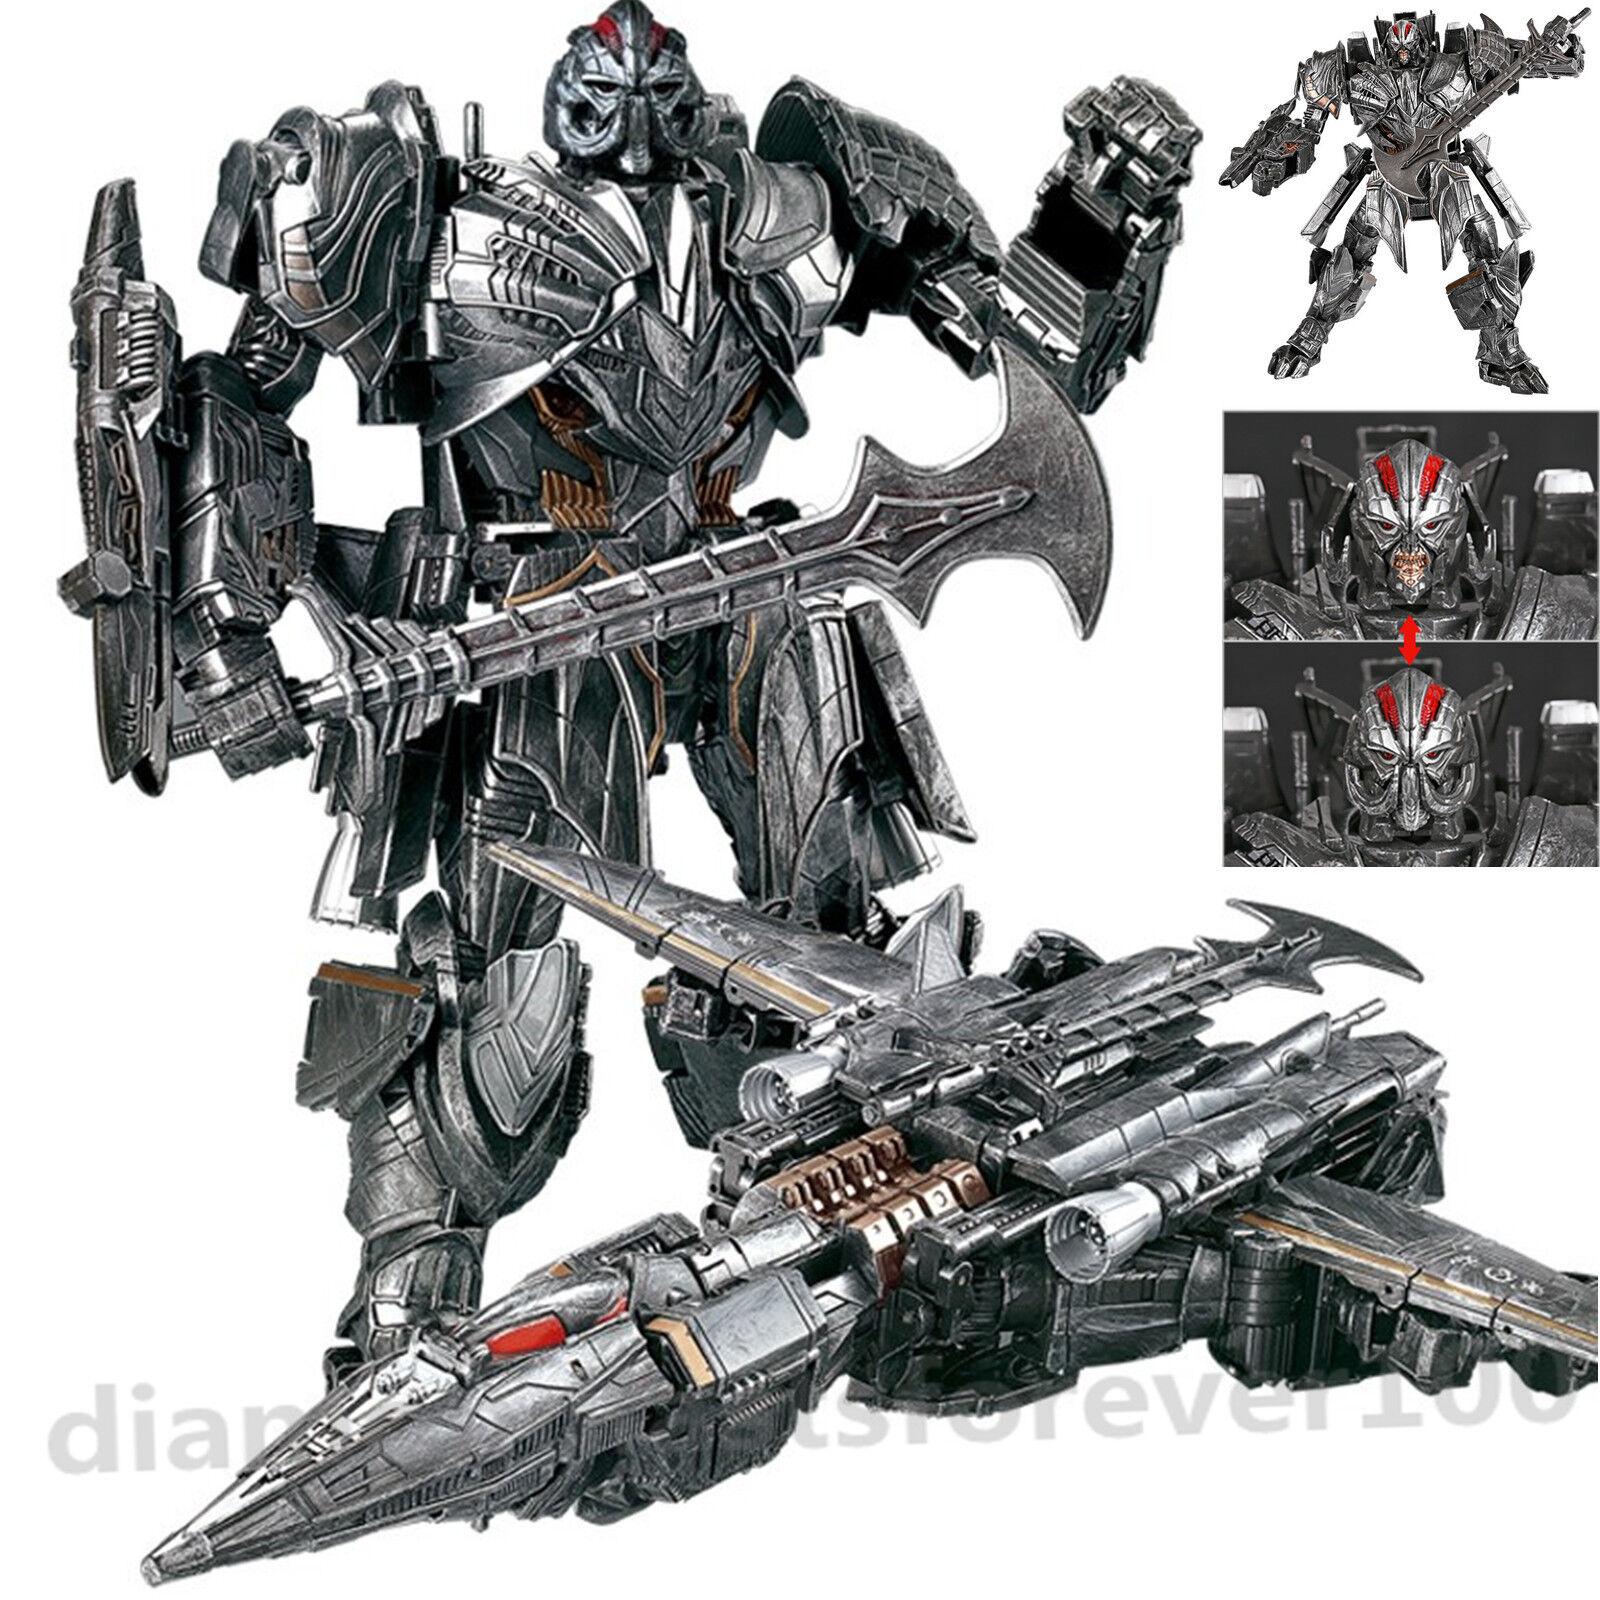 WeiJiang Transformer Megatron Action Figure Battle Damaged Rendsora Kid Toy Gift